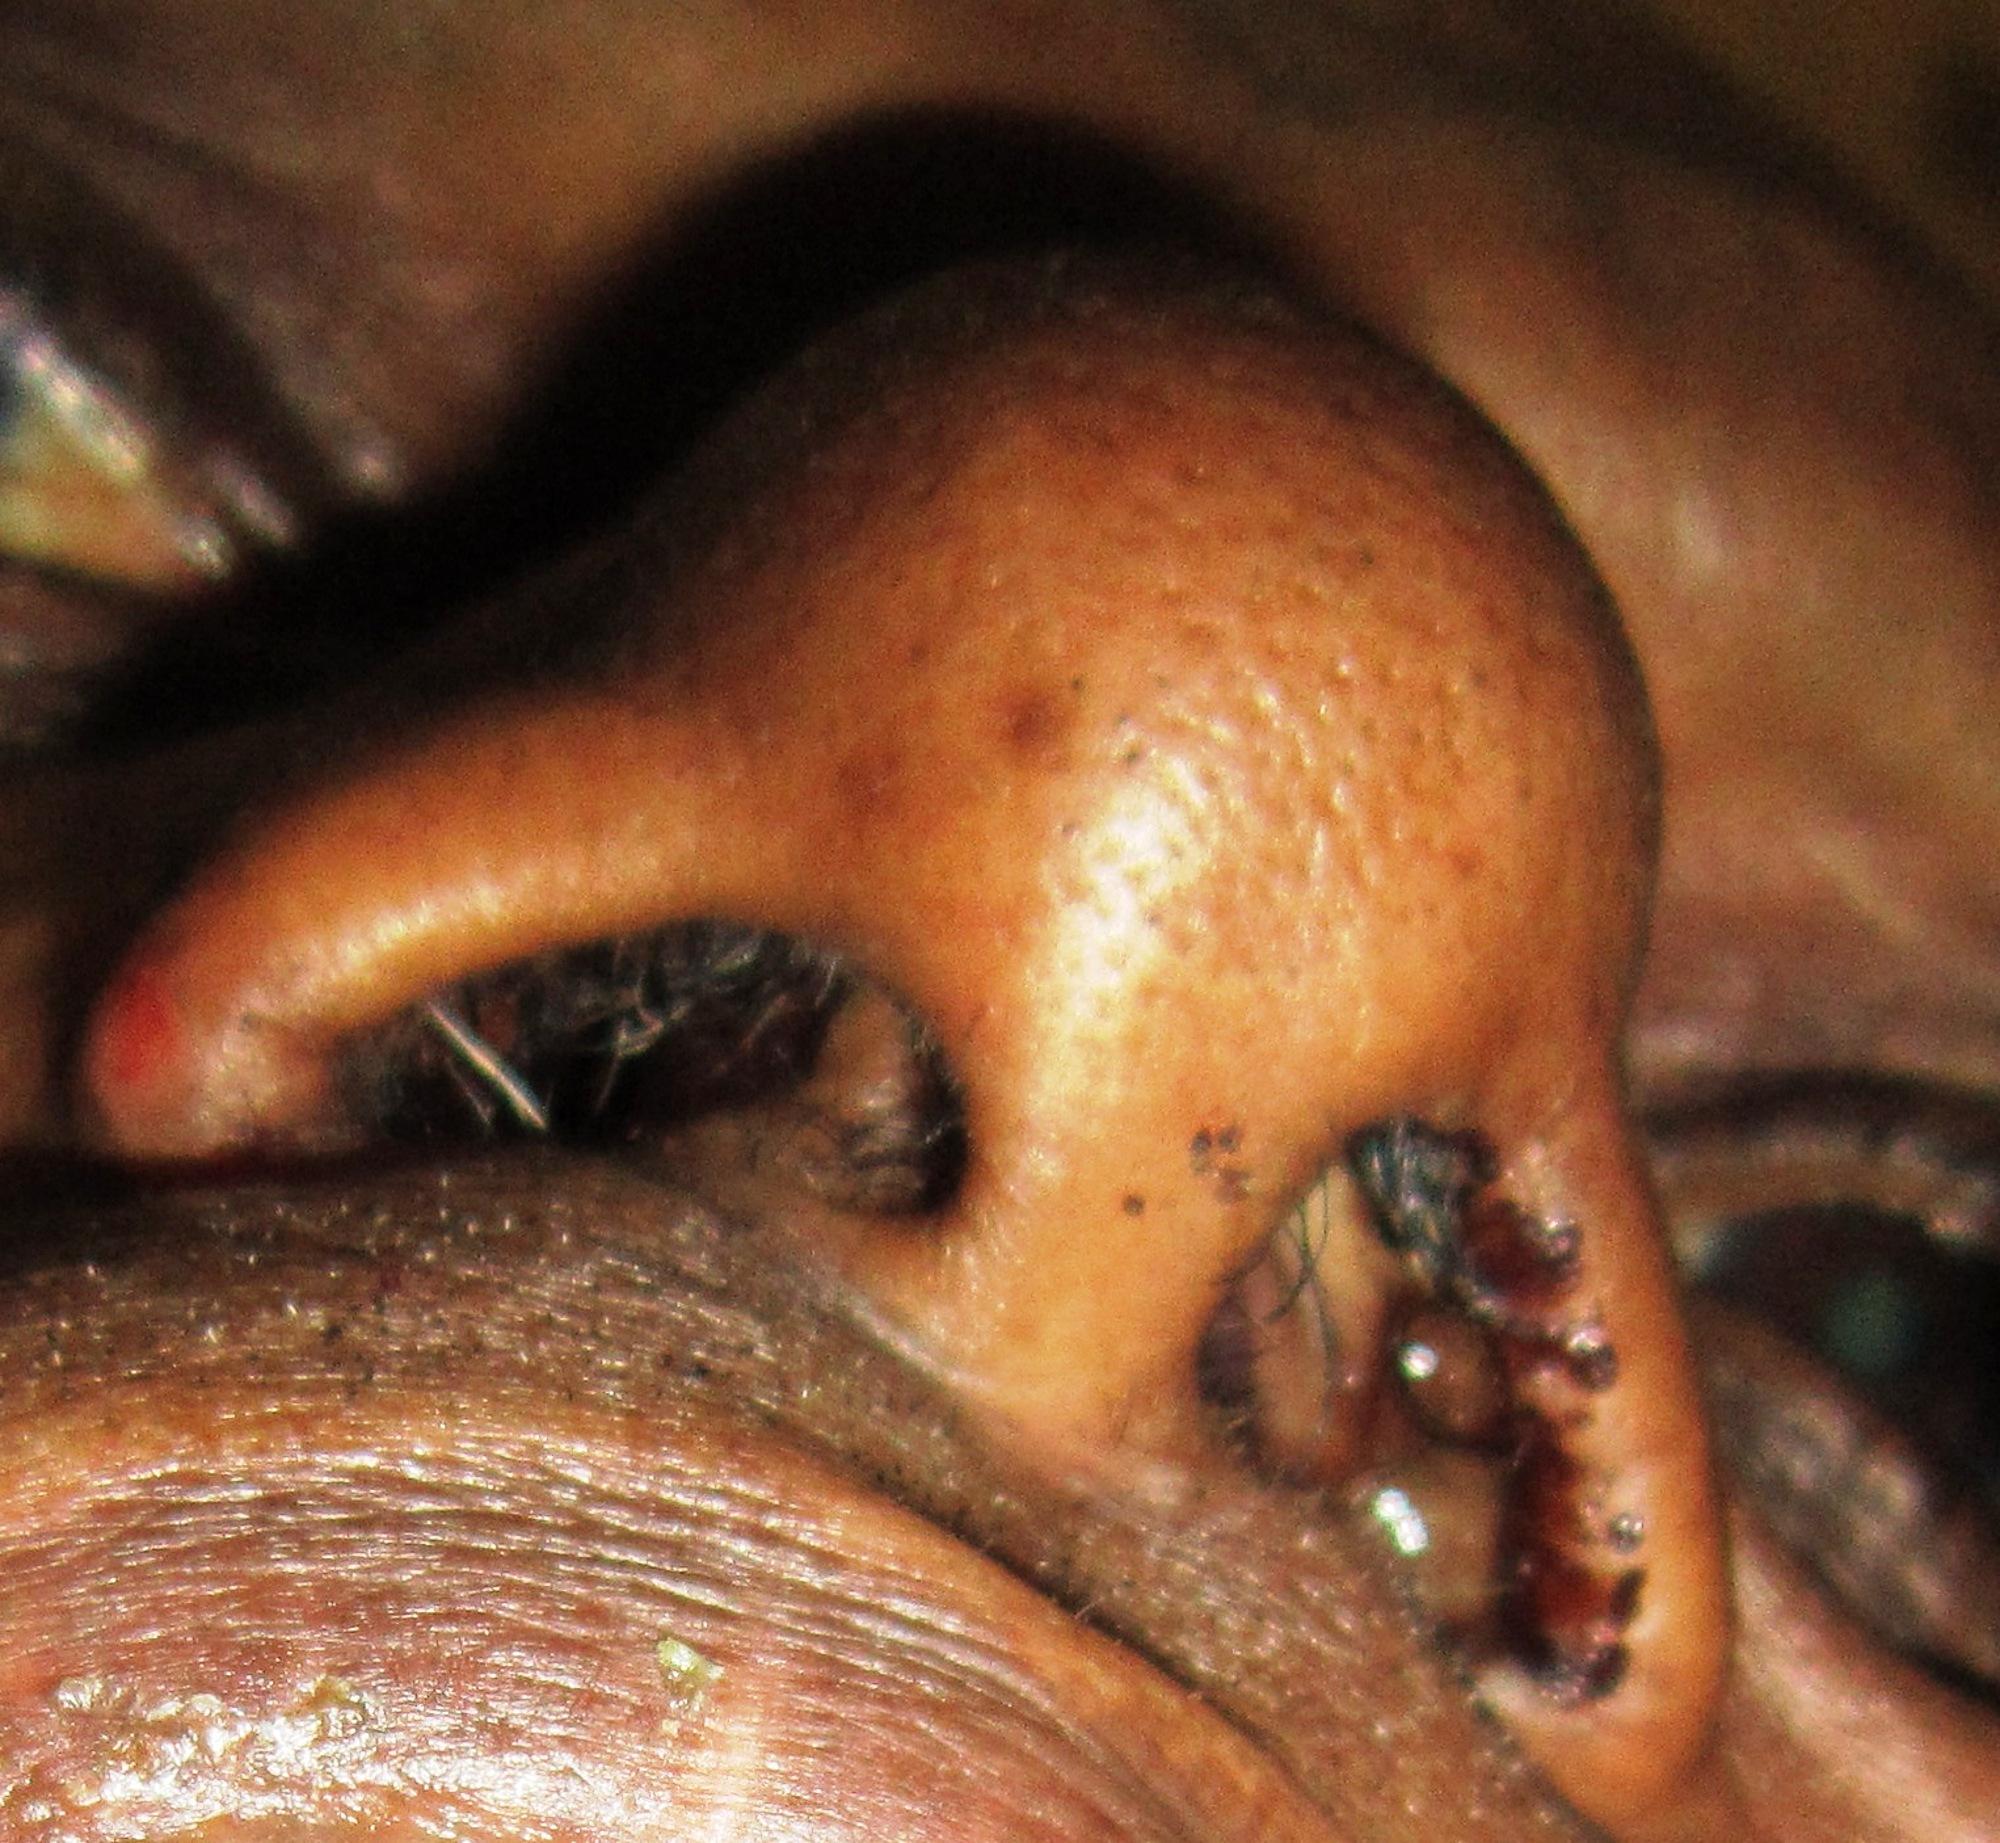 imagenes del virus papiloma humano en mujeres depistage cancer colorectal 95